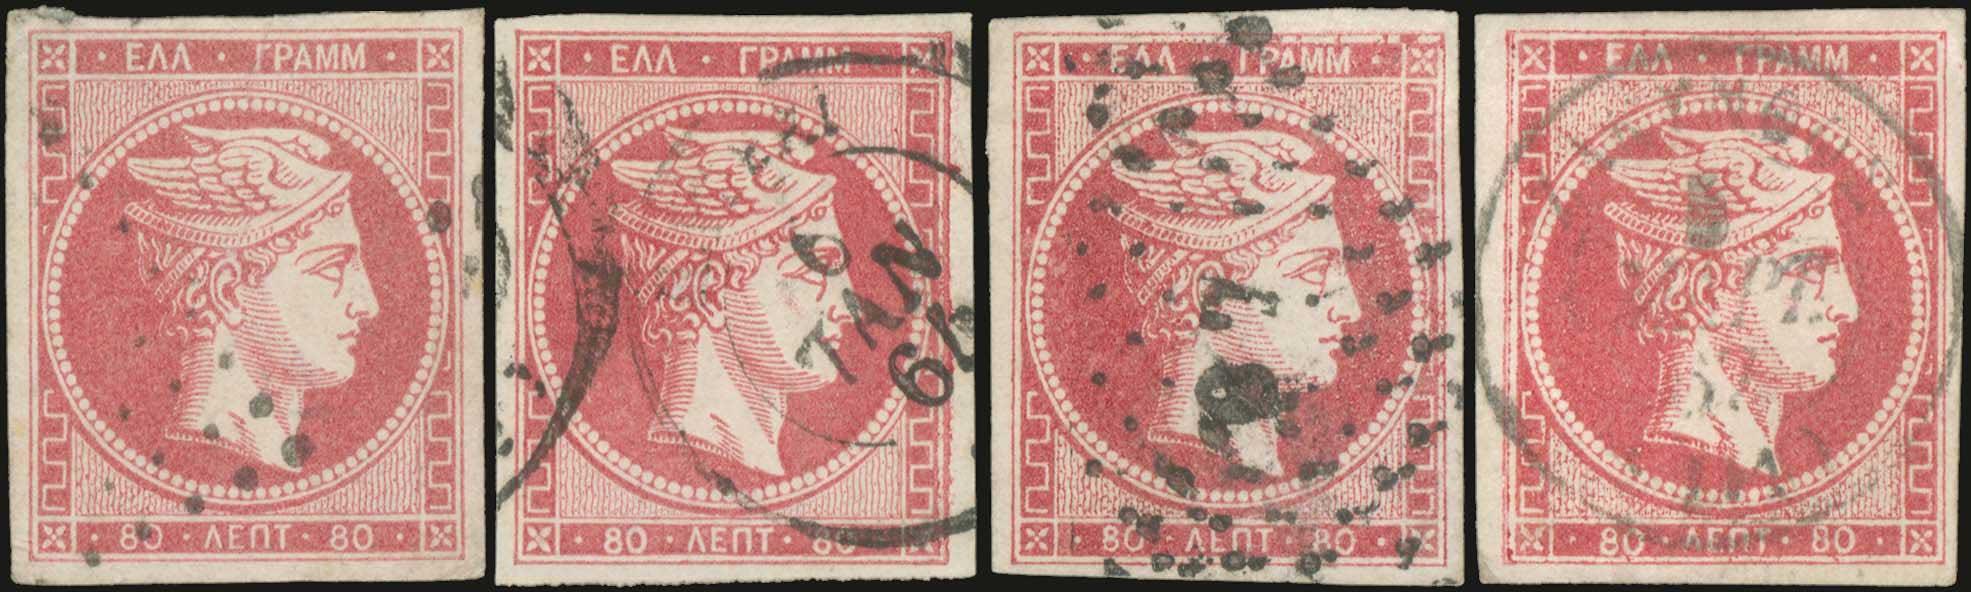 Lot 110 - large hermes head 1862/67 consecutive athens printings -  A. Karamitsos Postal & Live Internet Auction 680 General Philatelic Auction